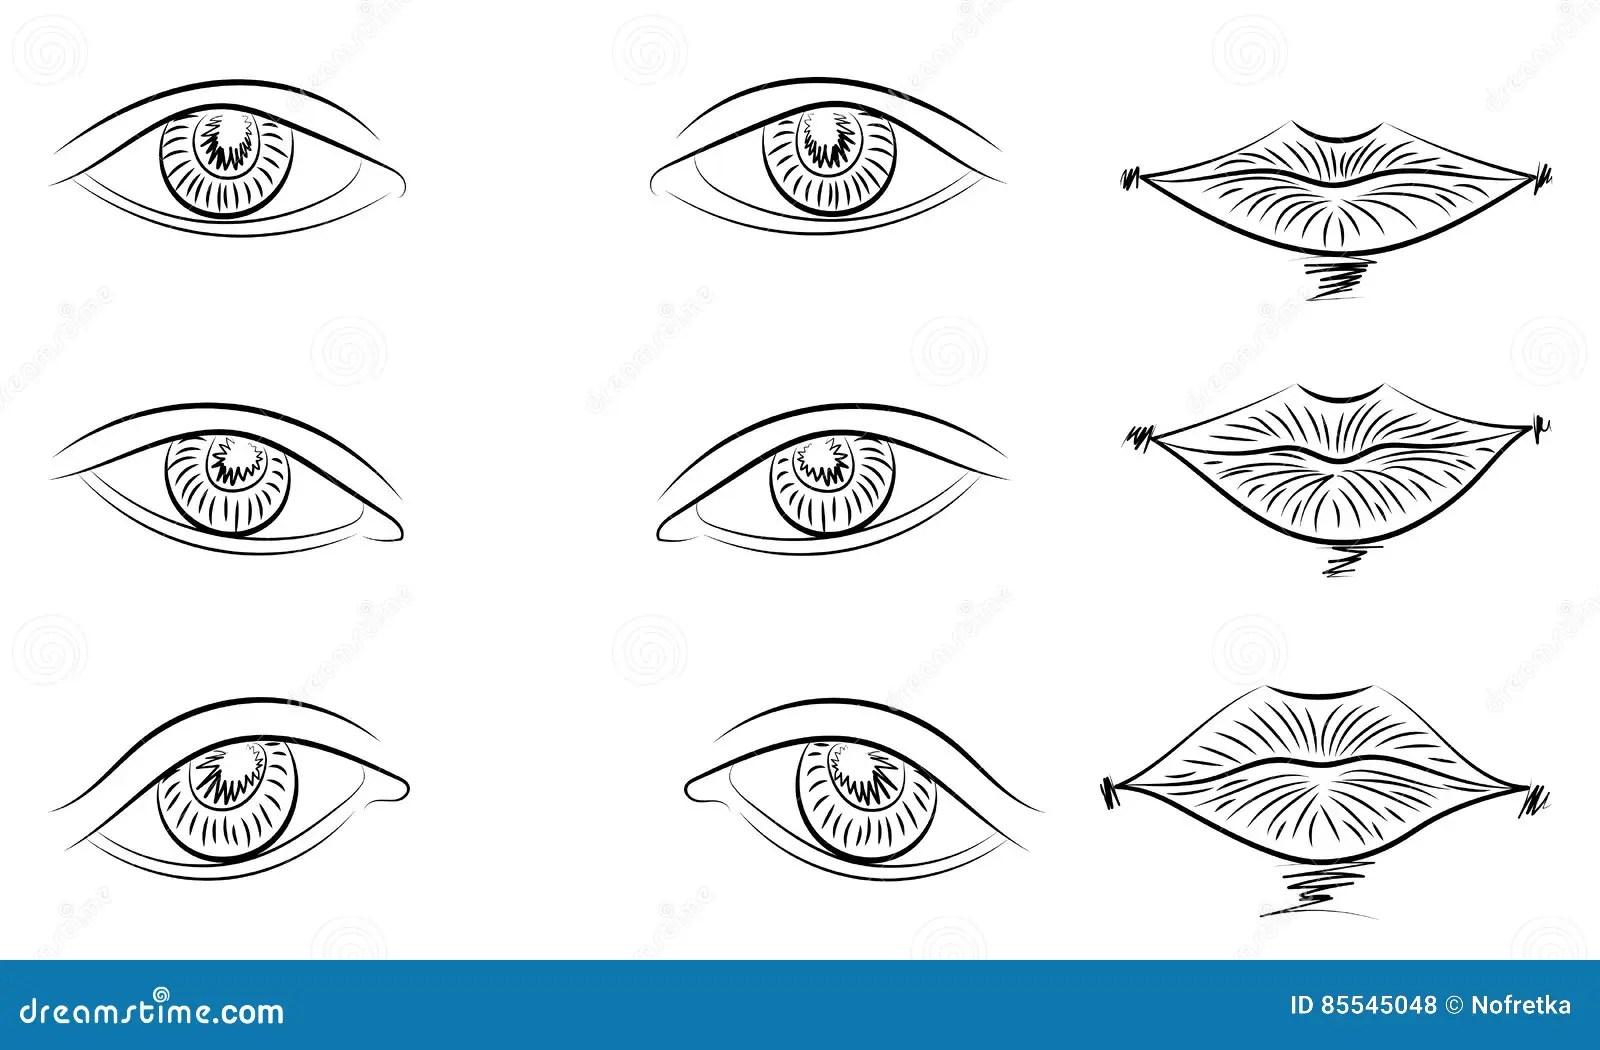 Eyes Types Of Strabismus Vector Illustration